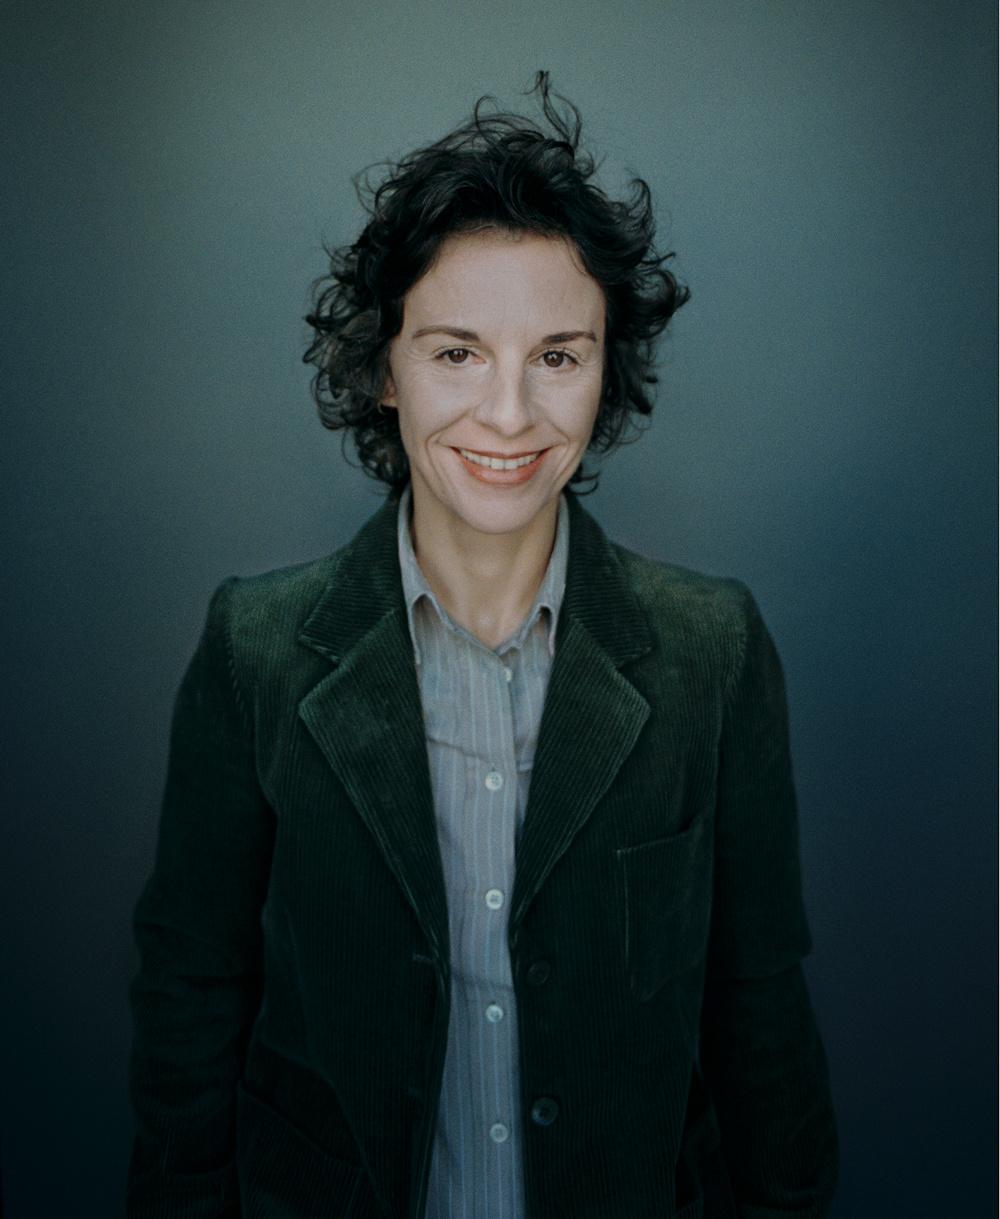 Valérie Belin || 2005